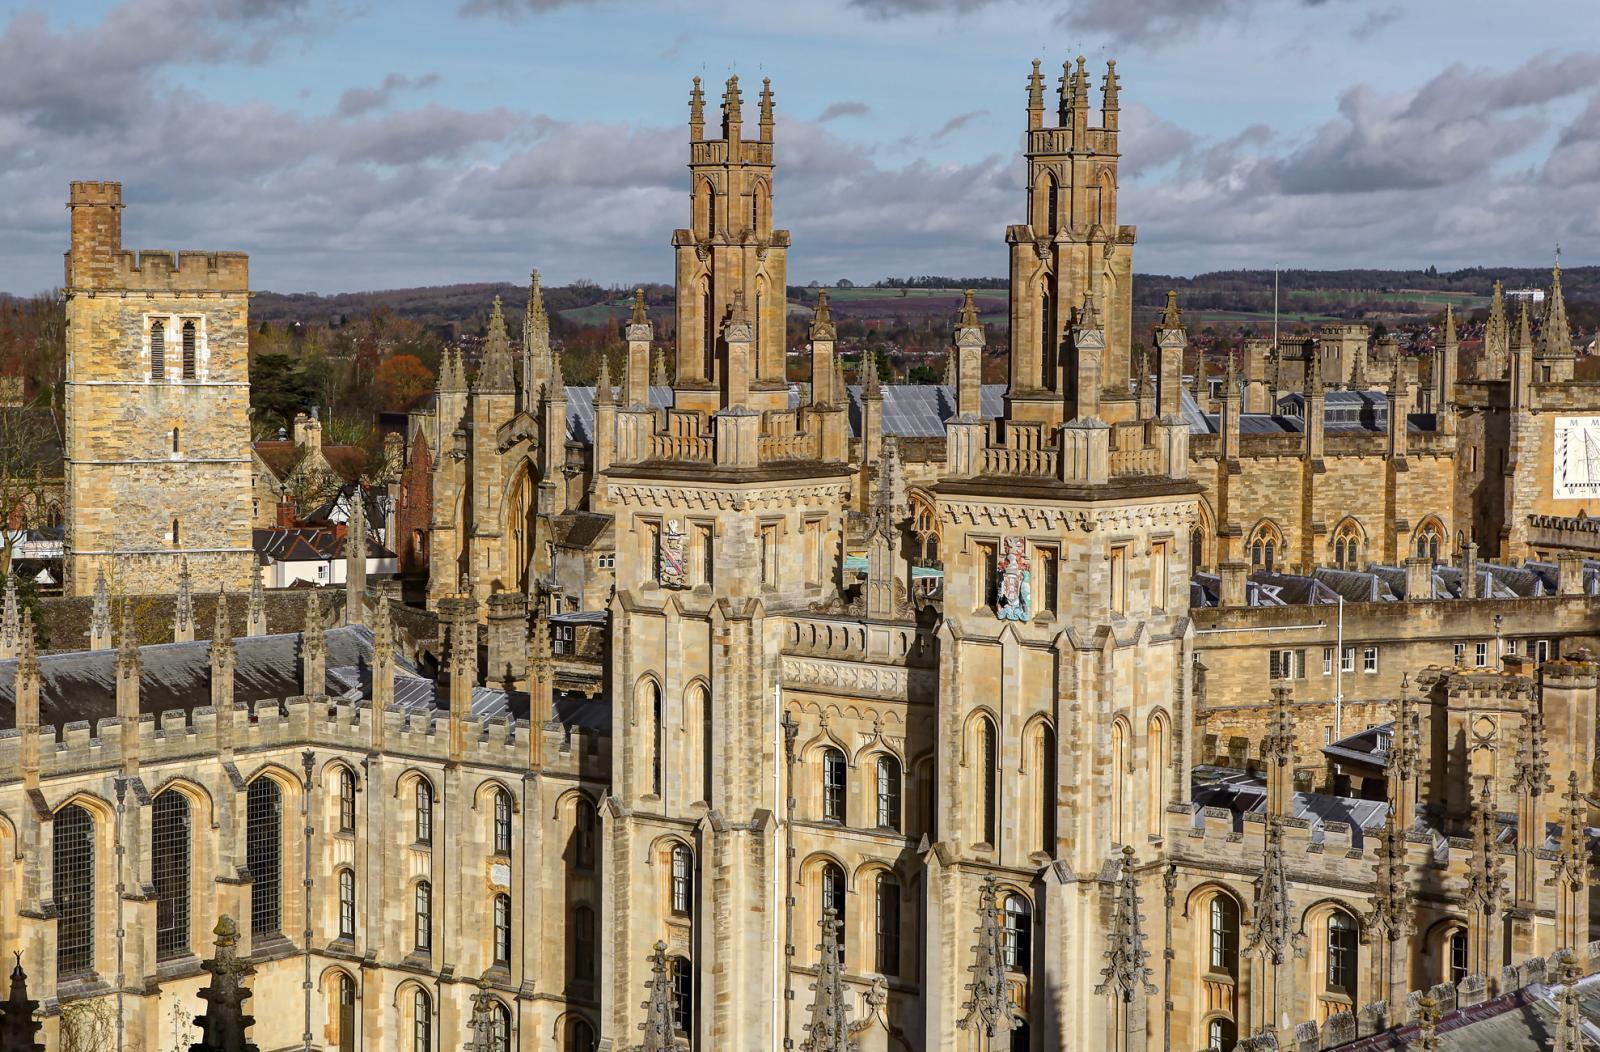 Tagesausflug nach Oxford